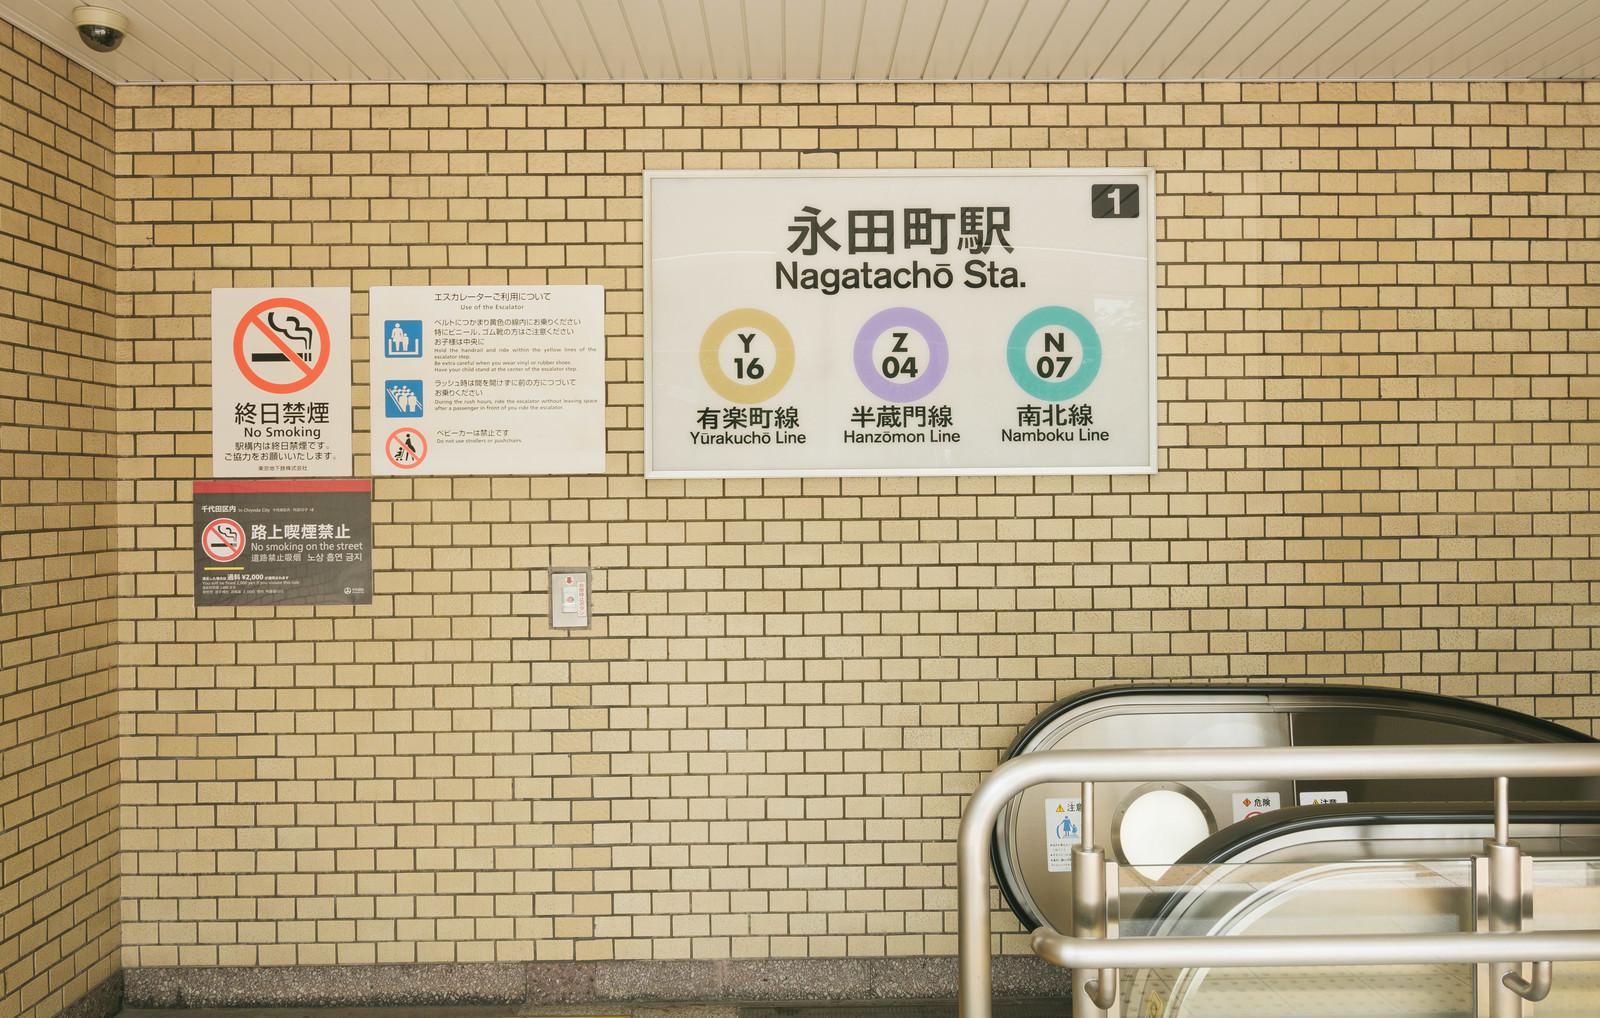 「永田町駅1番出口」の写真